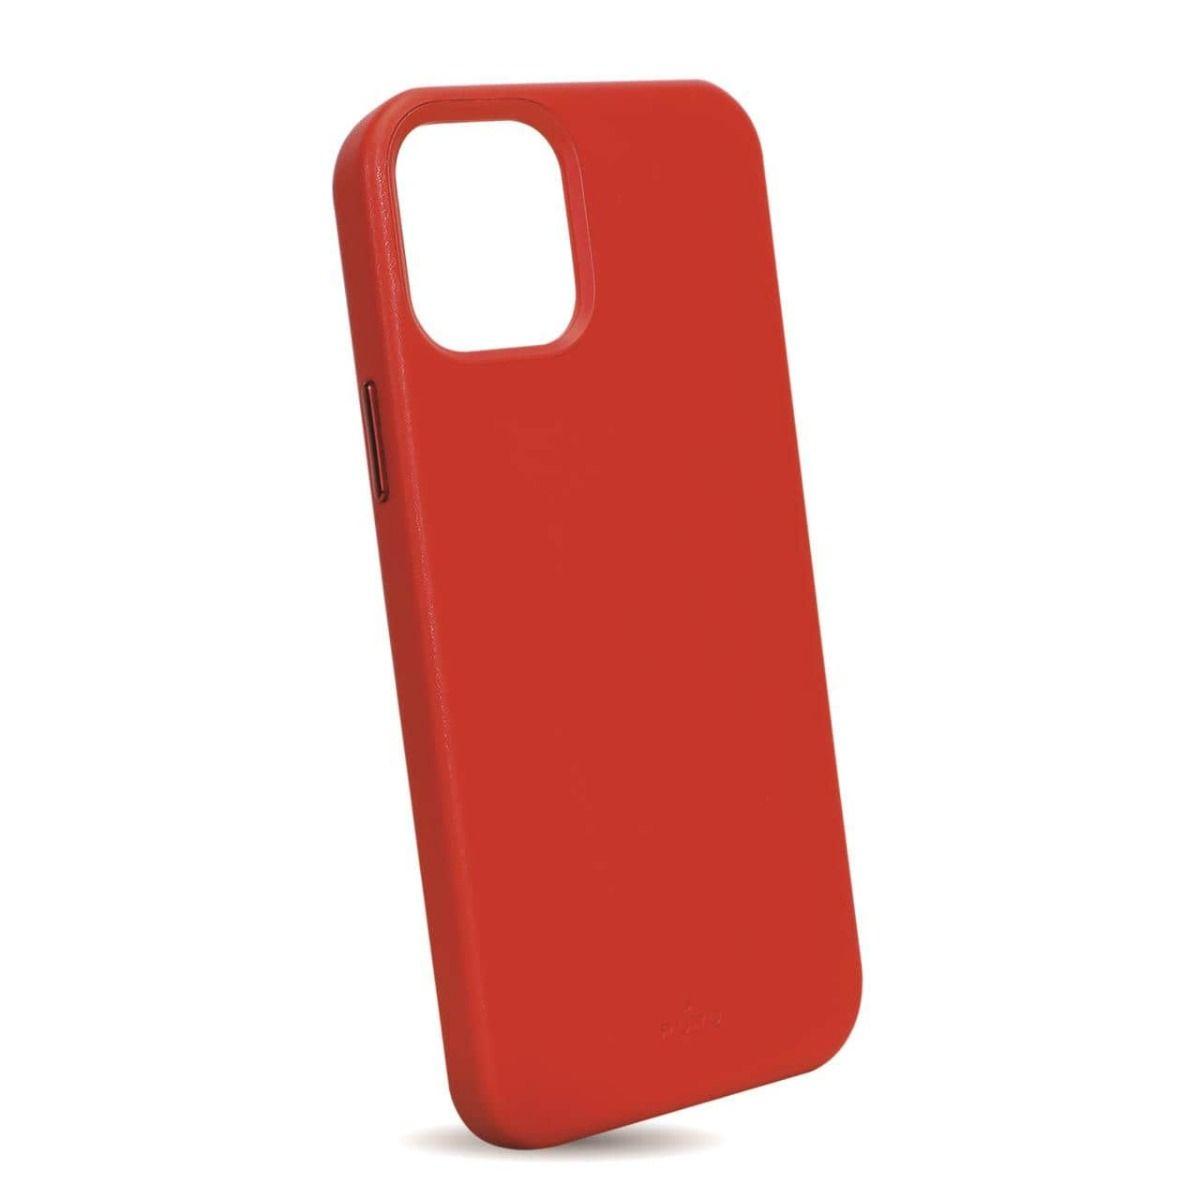 puro-cover-eco-pelle-sky-ihone-12-iphone-12pro-rossa_03-min_1835